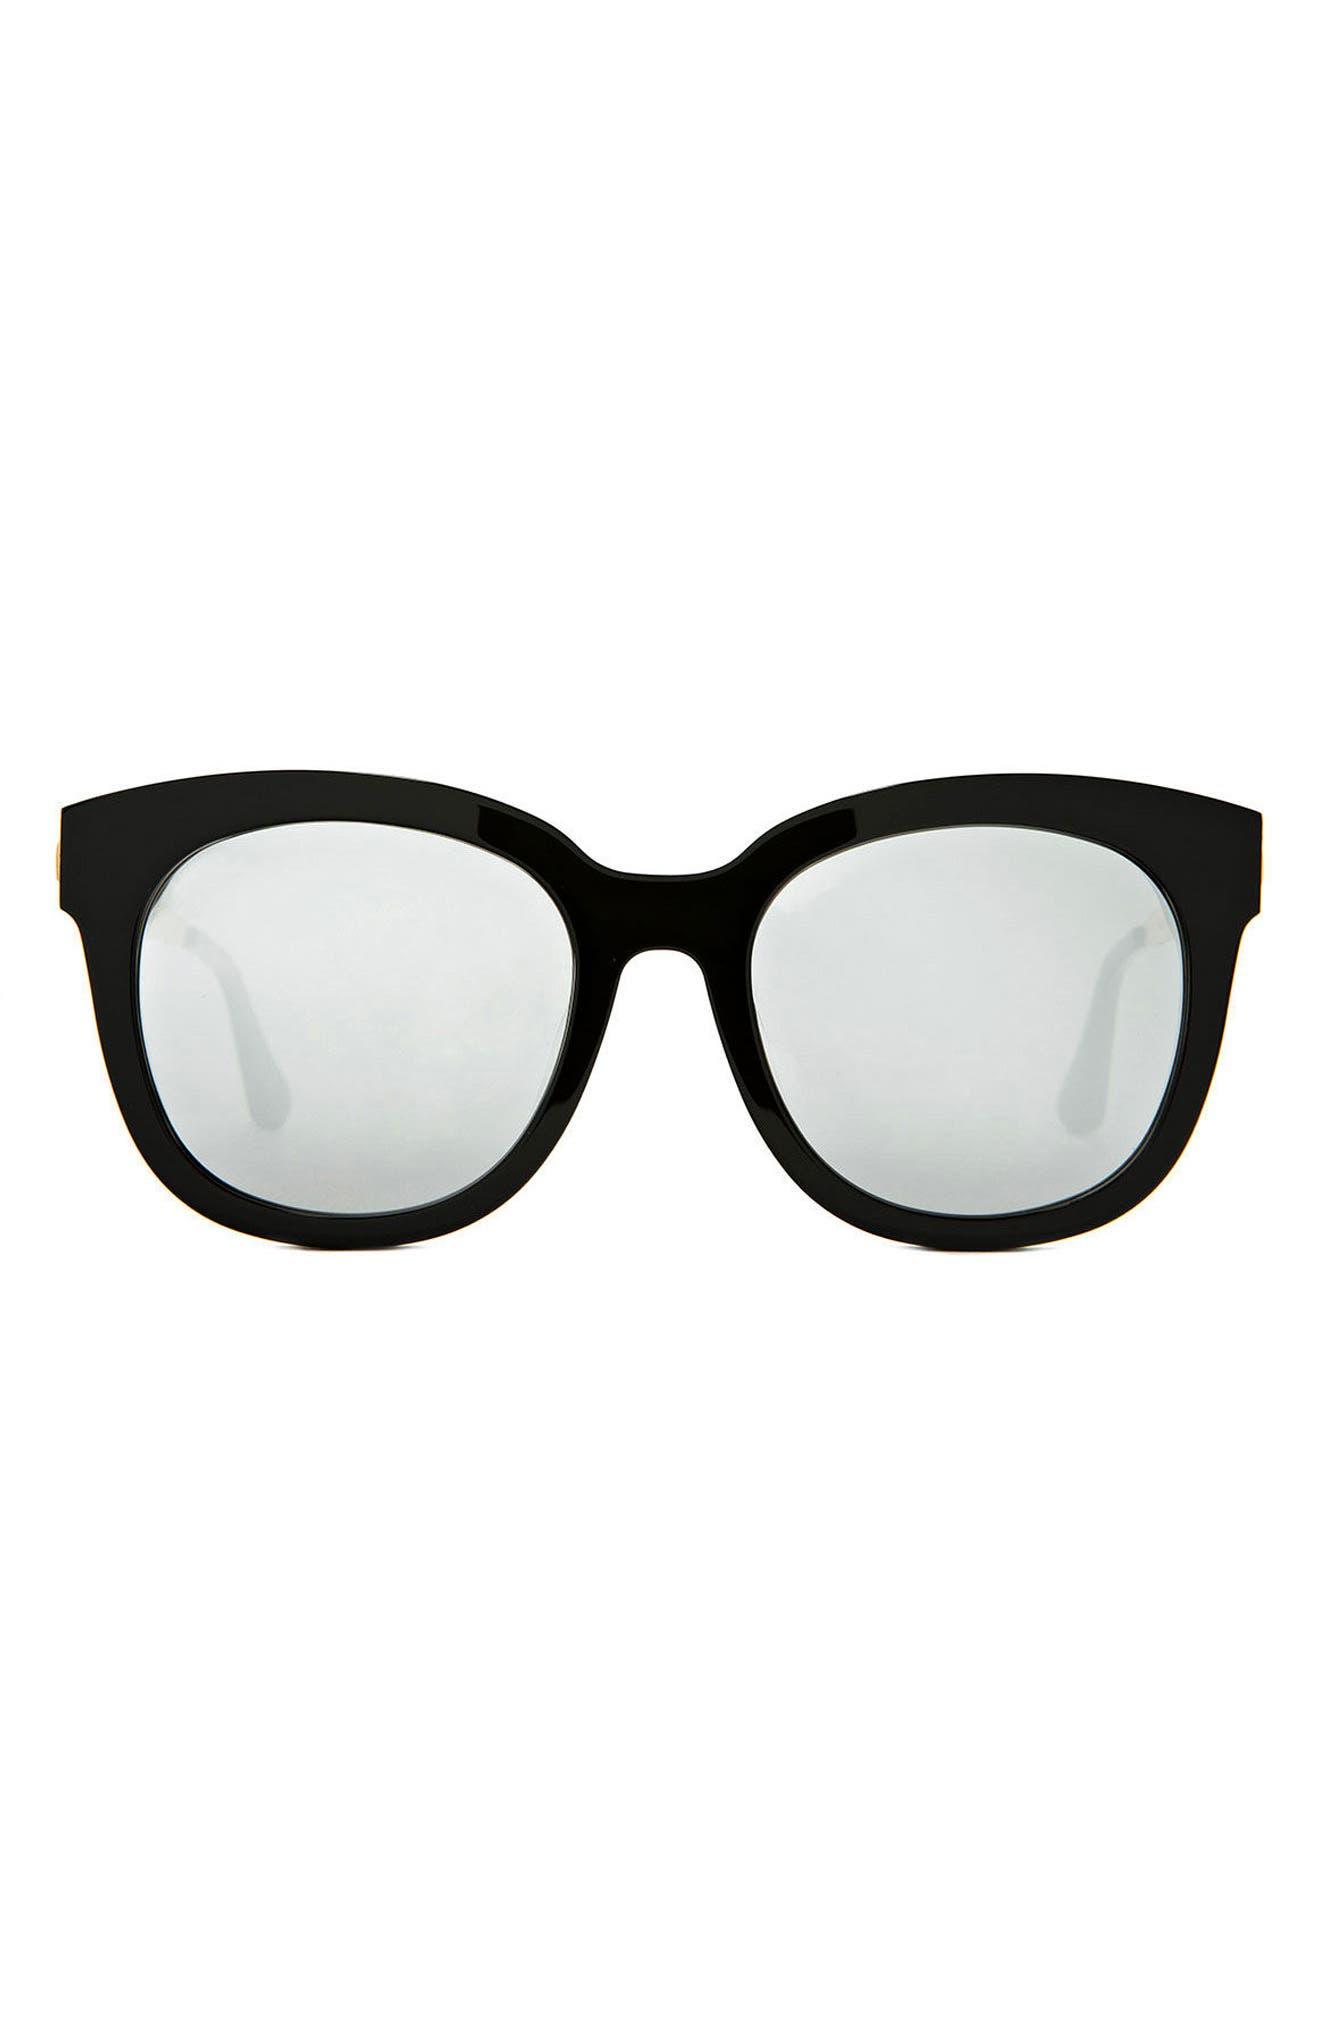 Cuba 55mm Sunglasses,                             Main thumbnail 1, color,                             Black/Silver